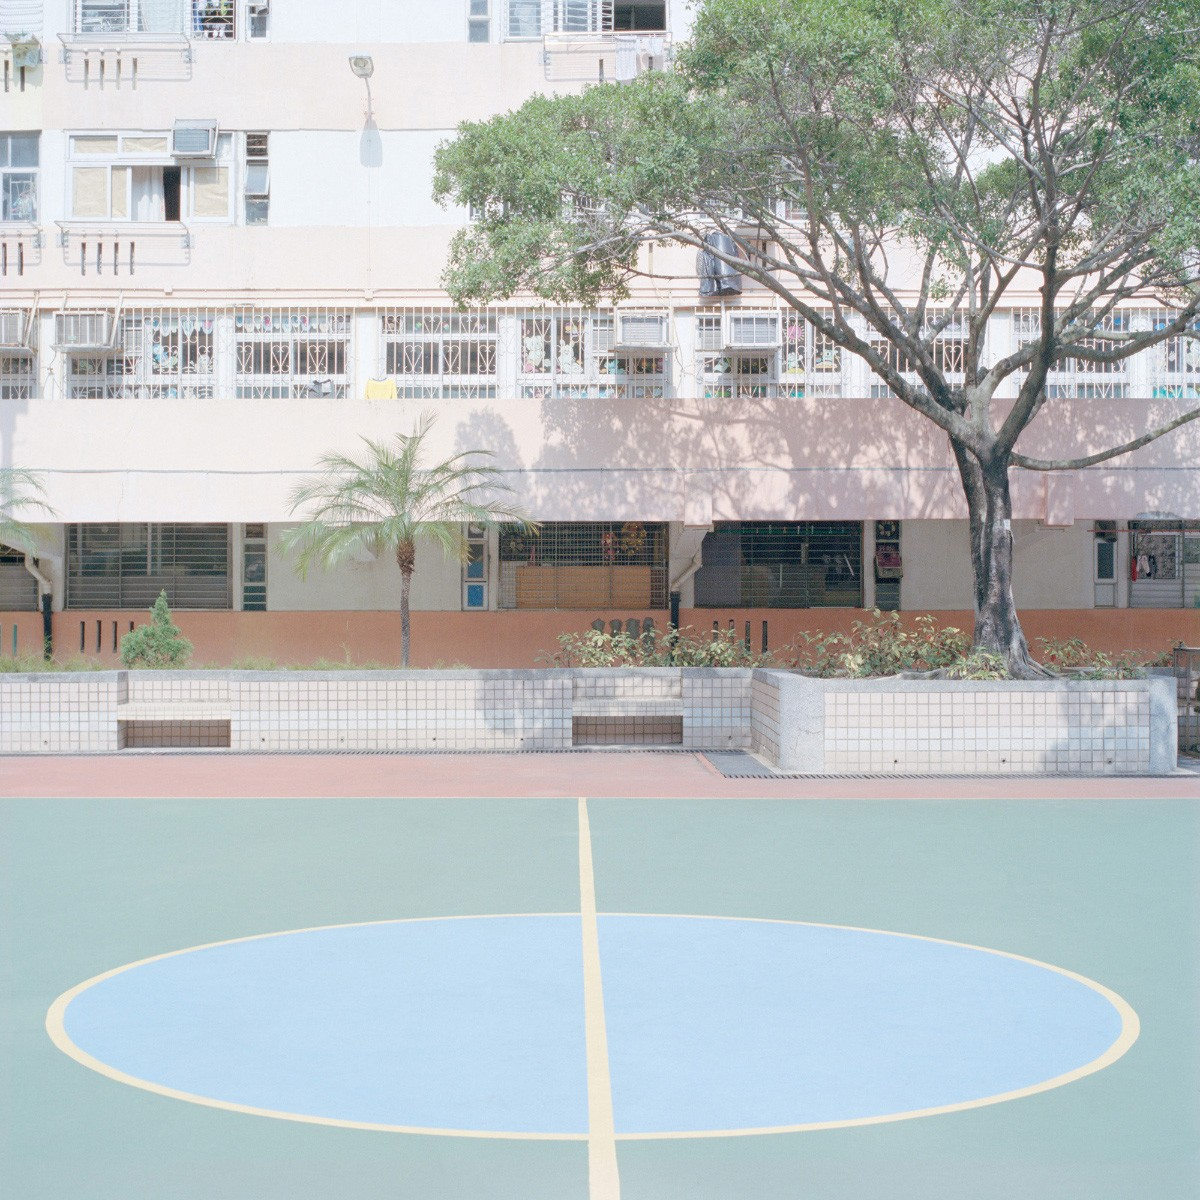 ward-roberts-courts-02.3-9e1ec344718923ecb68cc02b95bfee2a